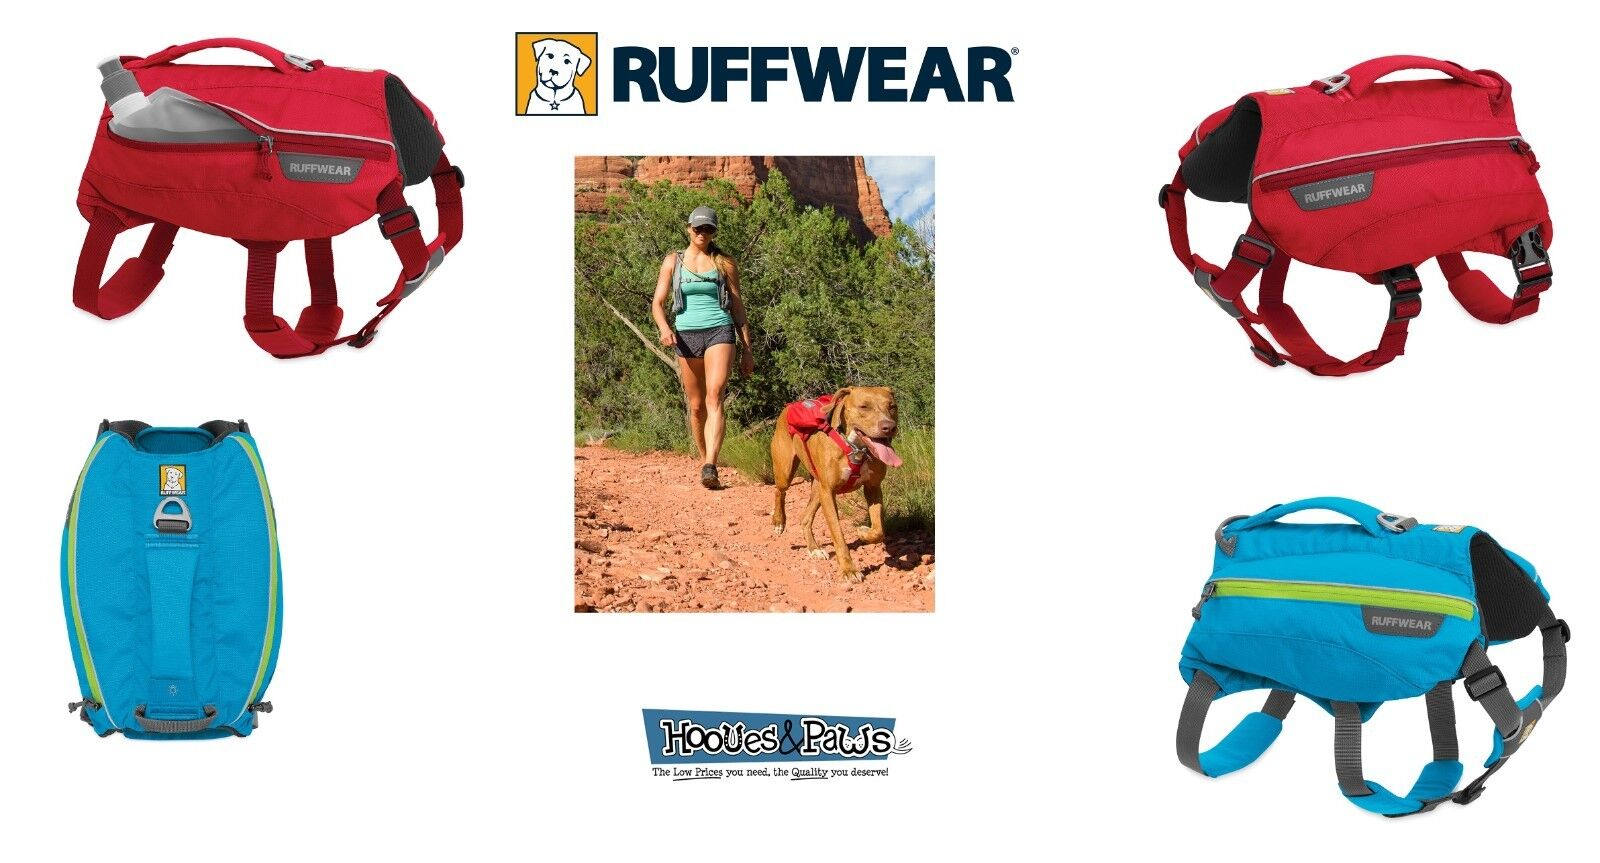 Sportbekleidung Singletrak Outdoor Wandern Hundefutter RückzugsHydrierung Satteltaschen